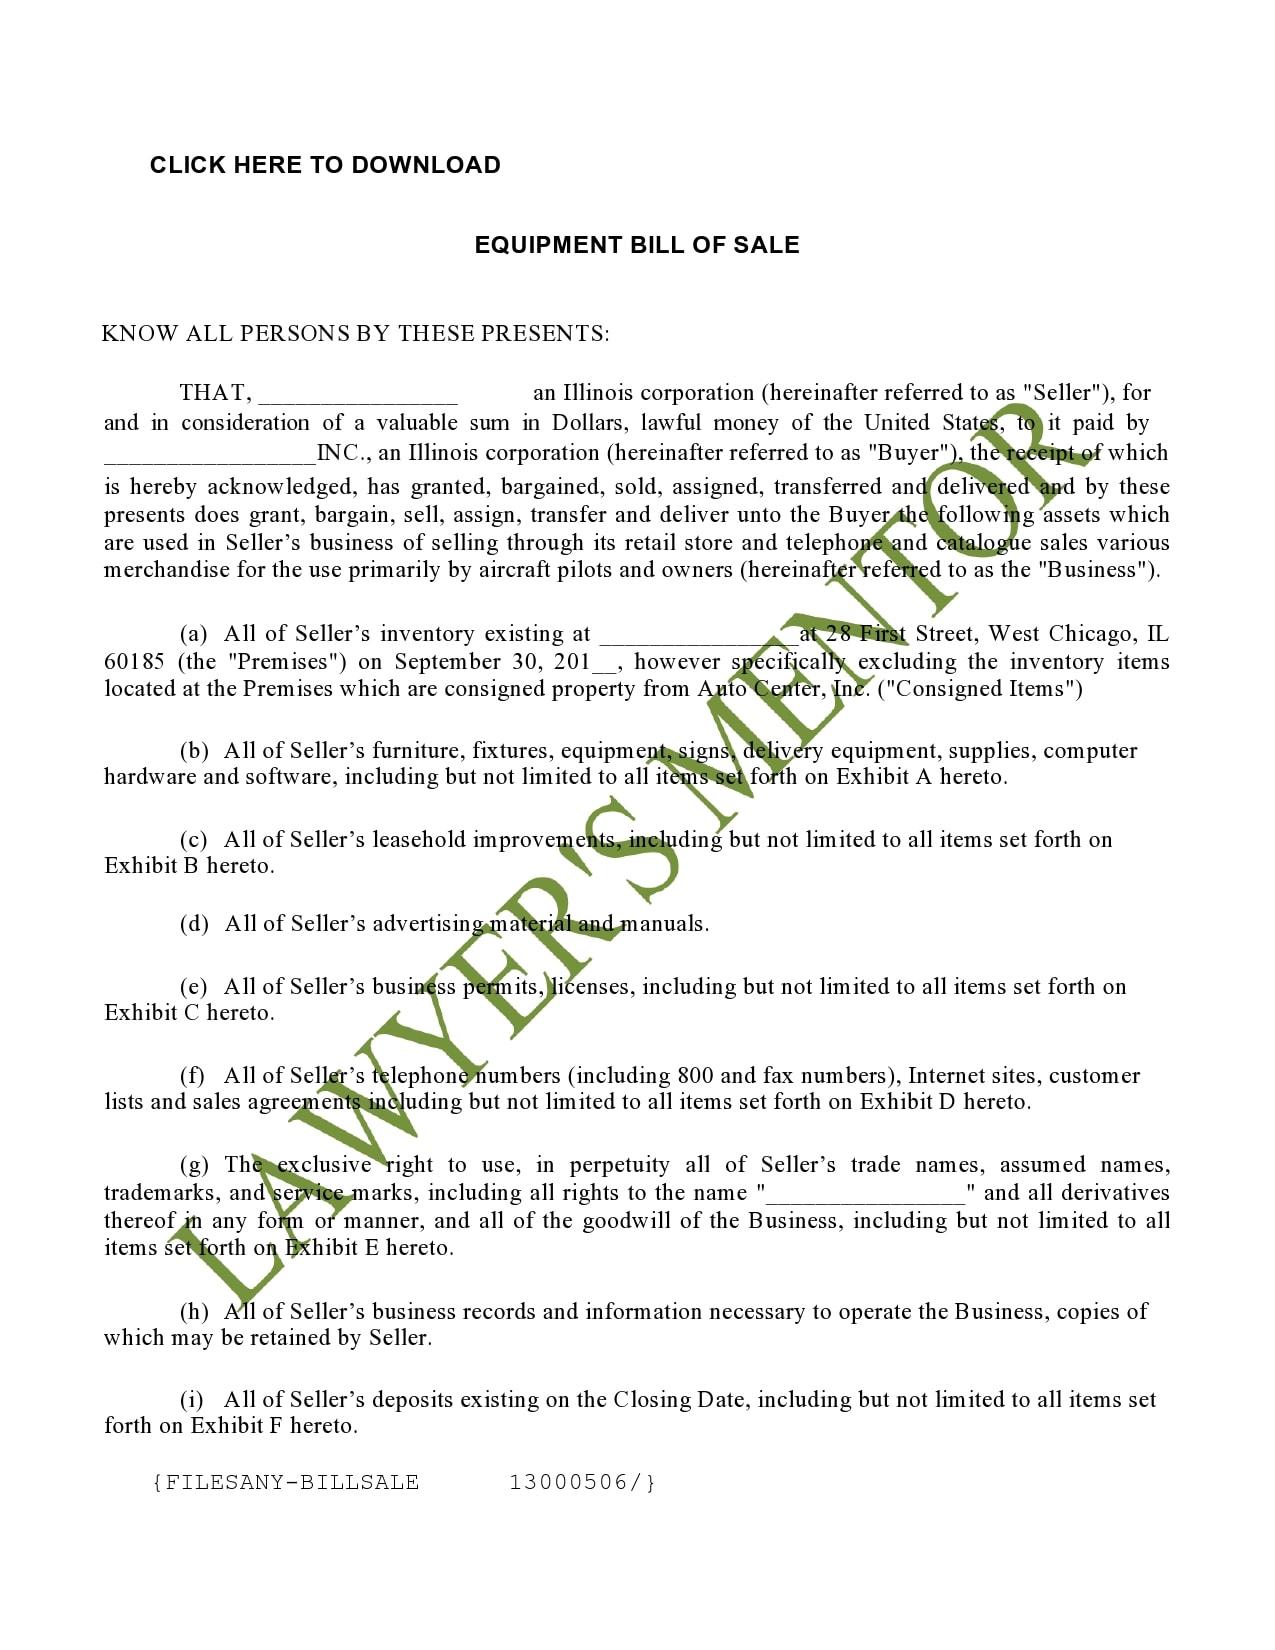 equipment bill of sale 26